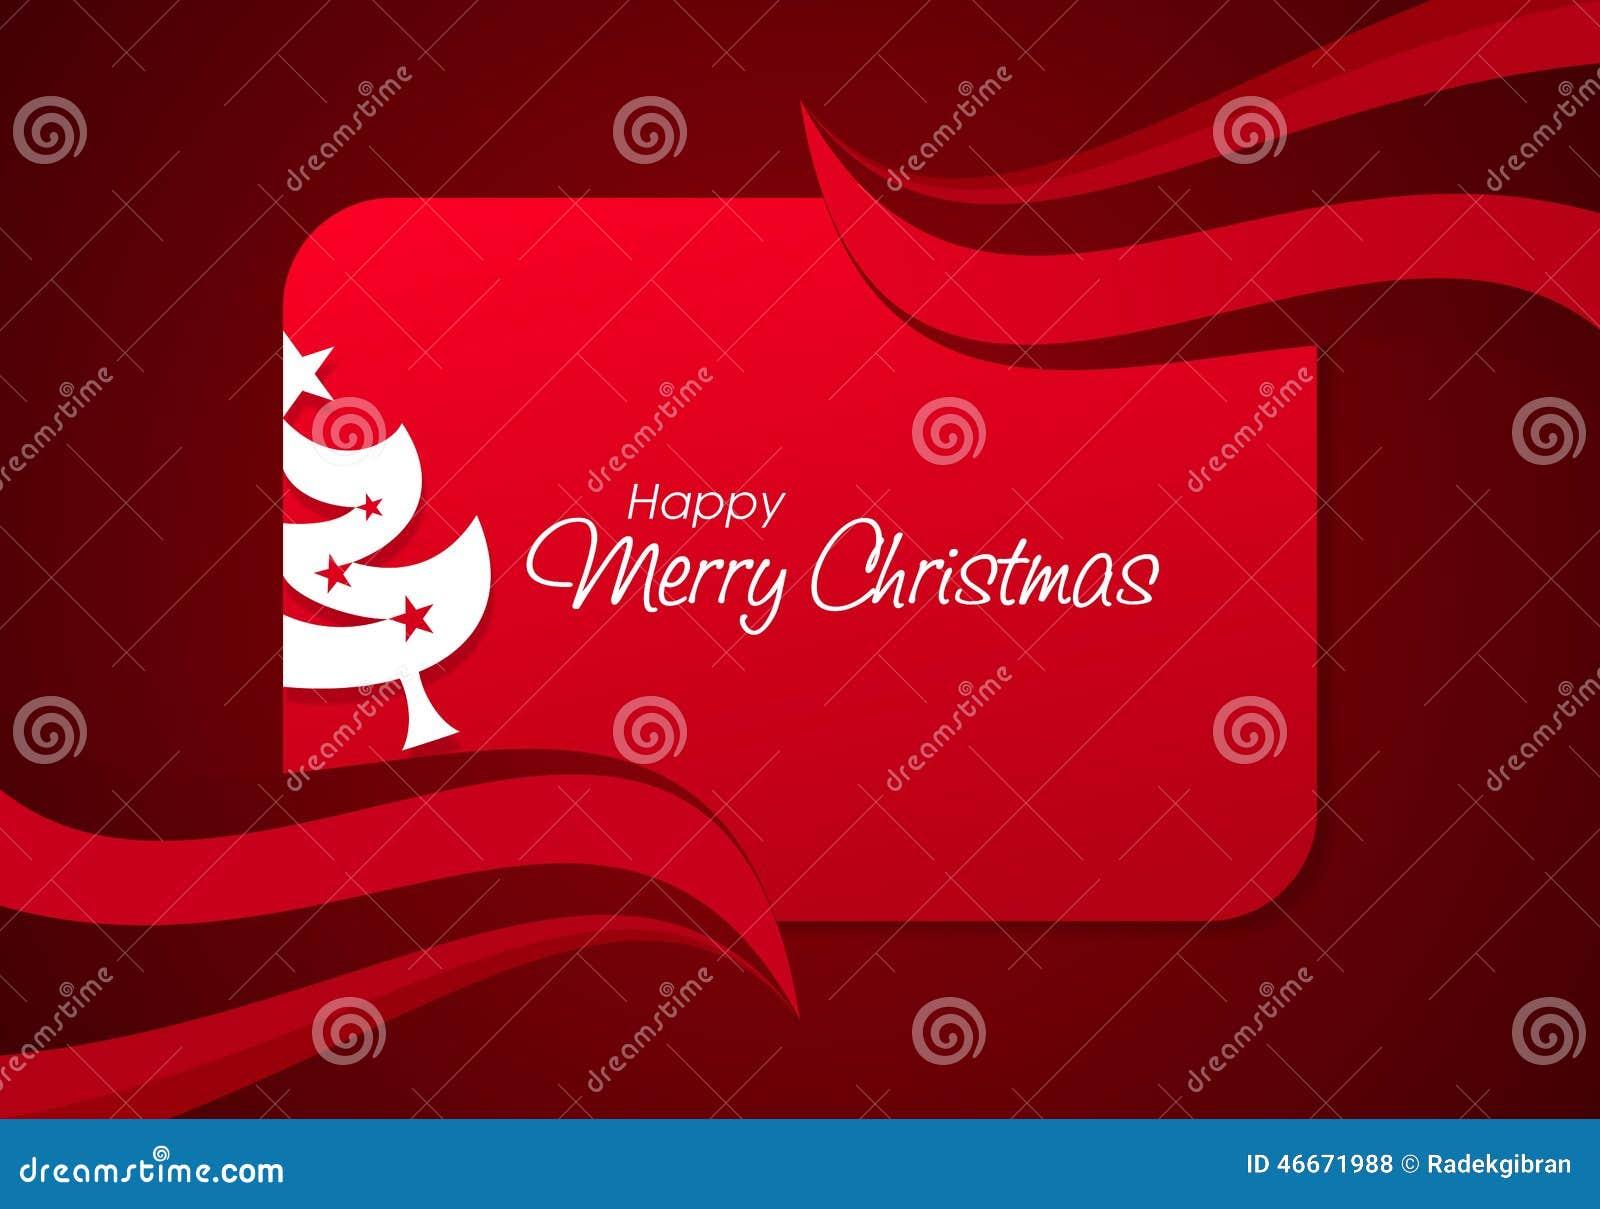 Merry Christmas Greeting Cardsholidayframehappy Merry Christmas